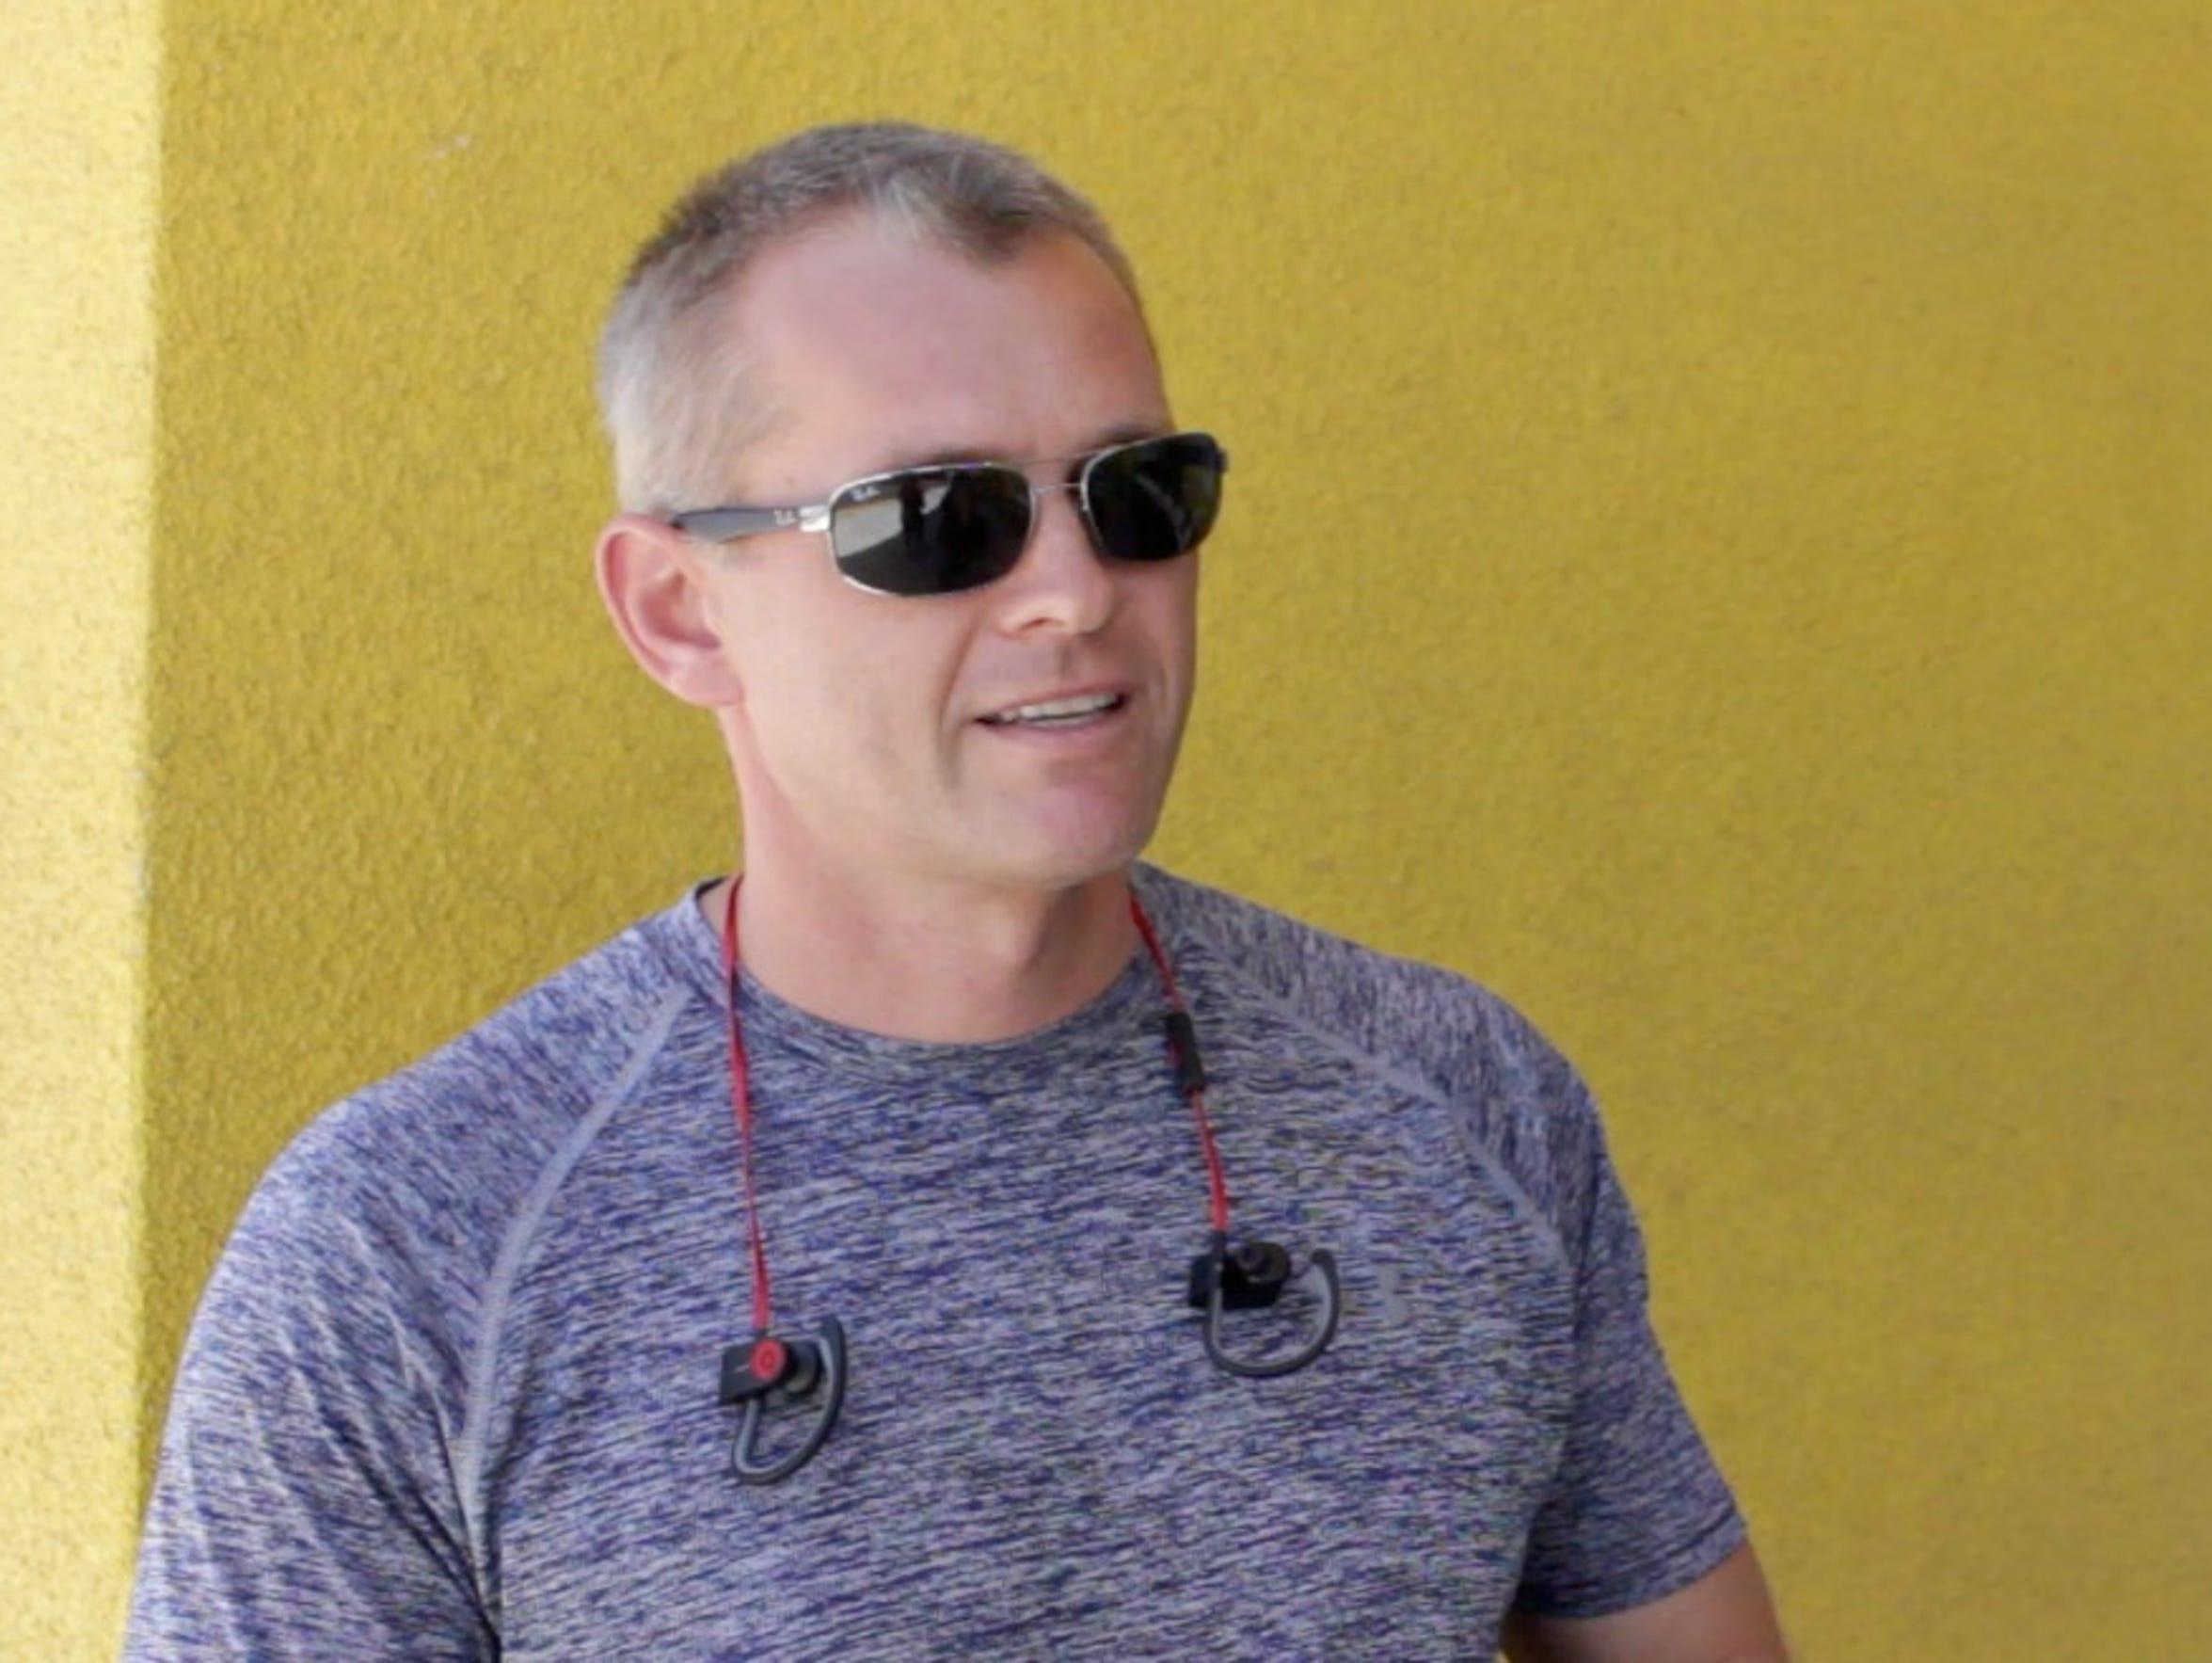 Coachella resident Gregory Iosza said he would bike